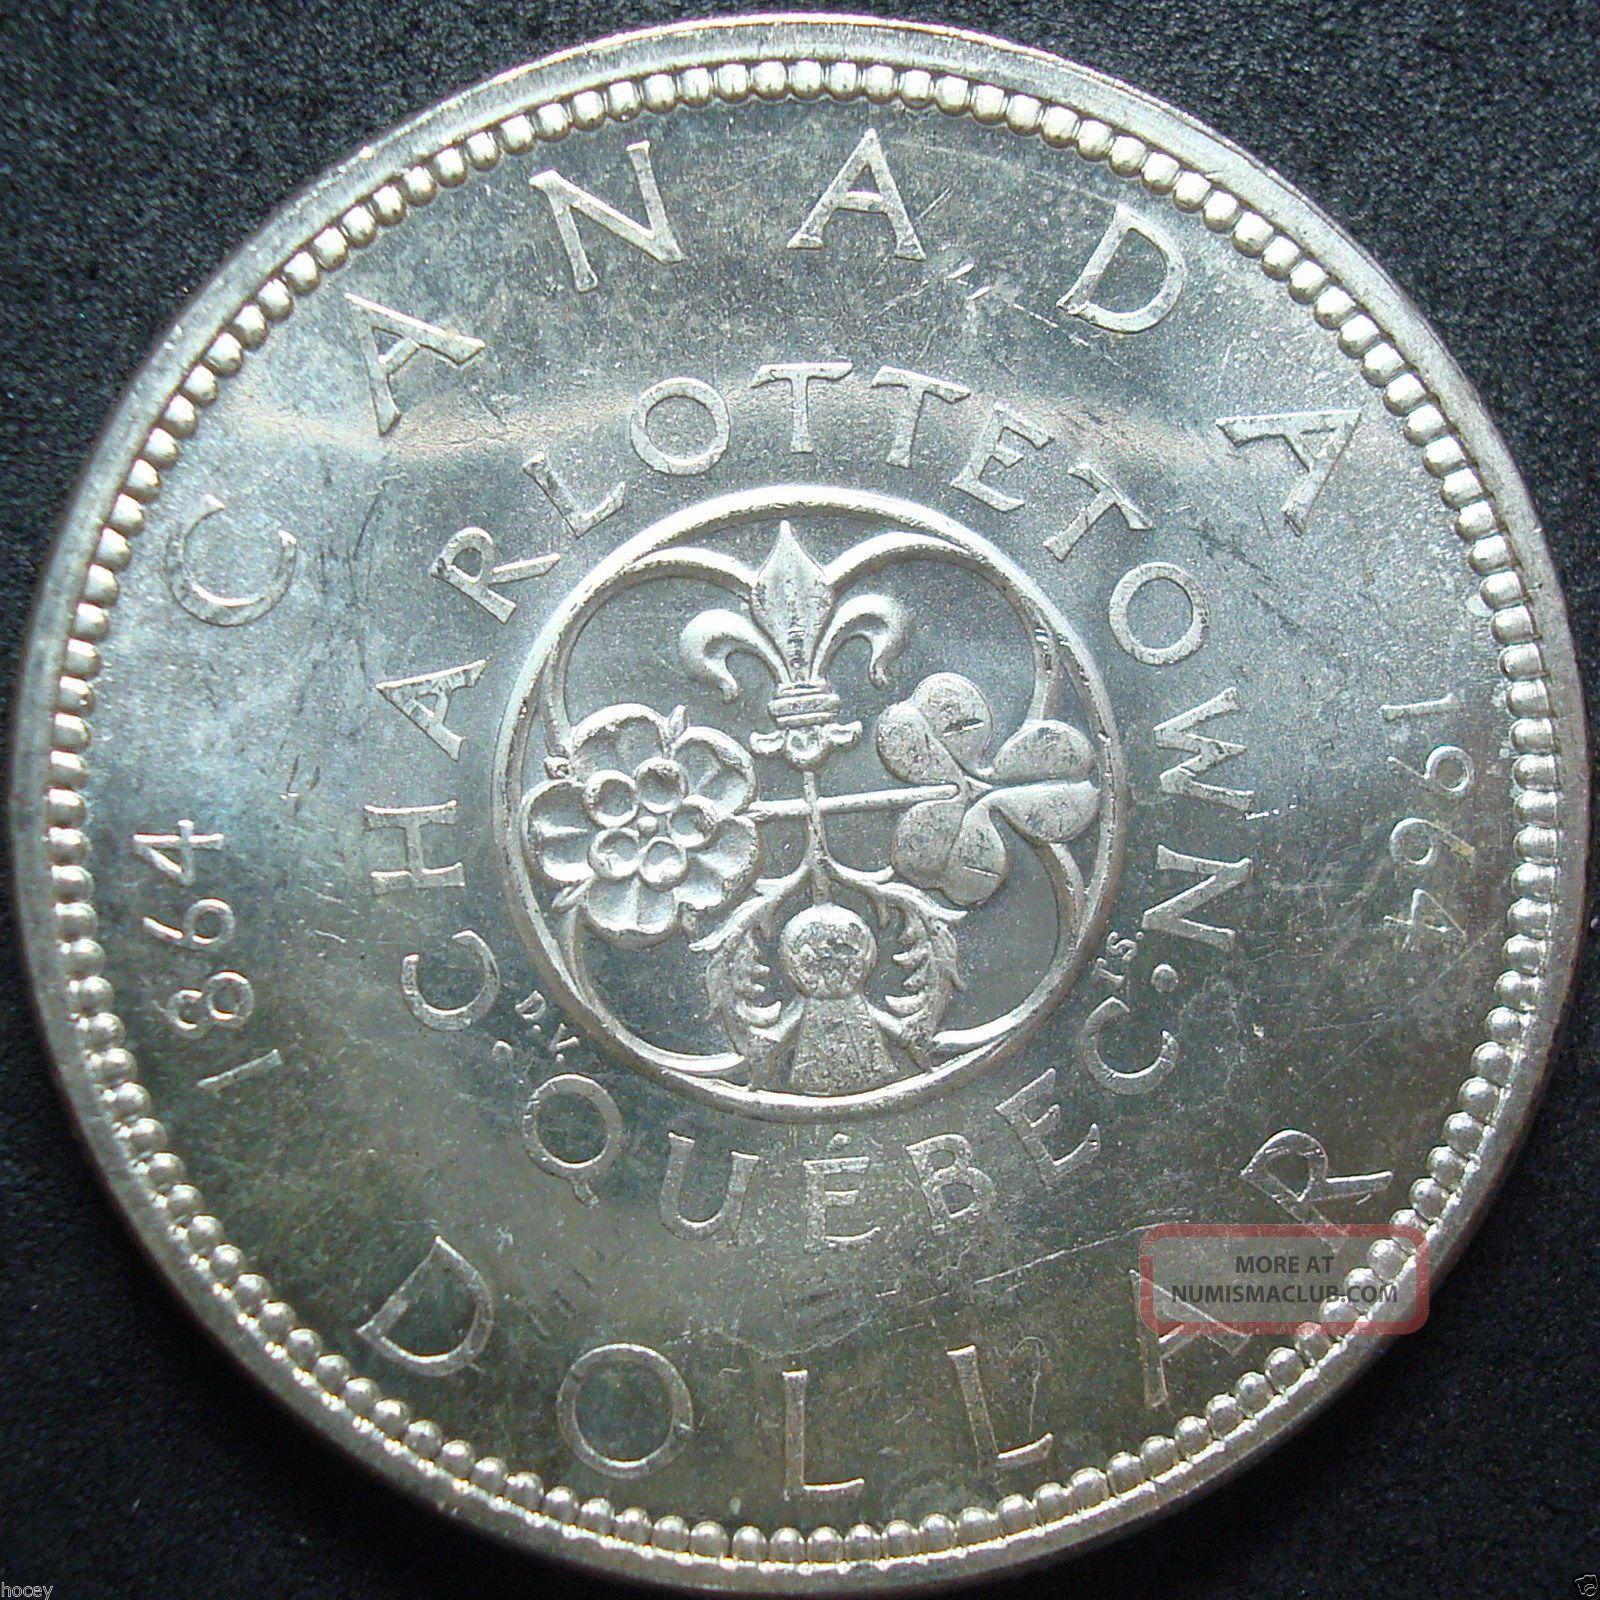 1964 Canada Charlottetown Quebec Silver Dollar Coin